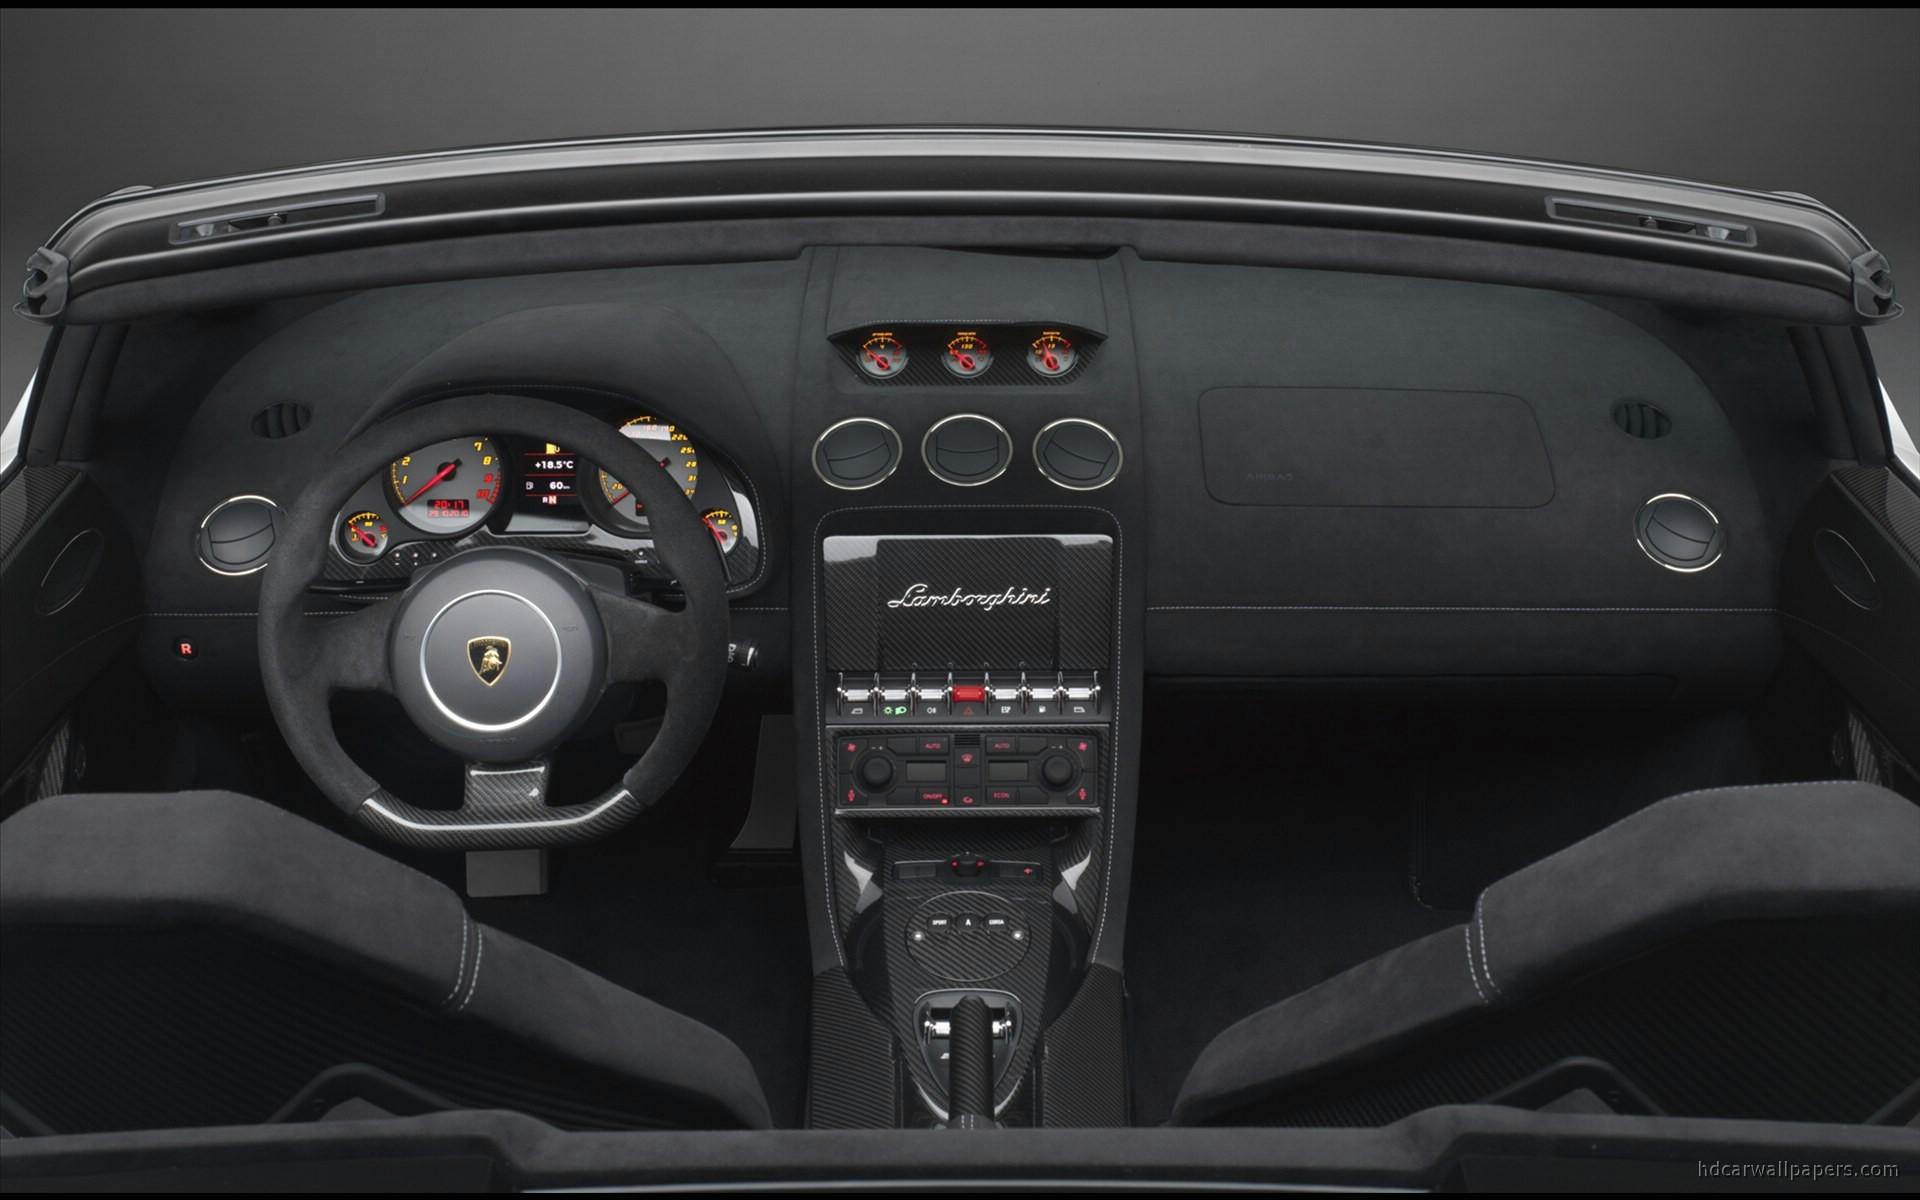 2011 Lamborghini Gallardo Lp570 4 Spyder Performante HD Wallpapers Download free images and photos [musssic.tk]